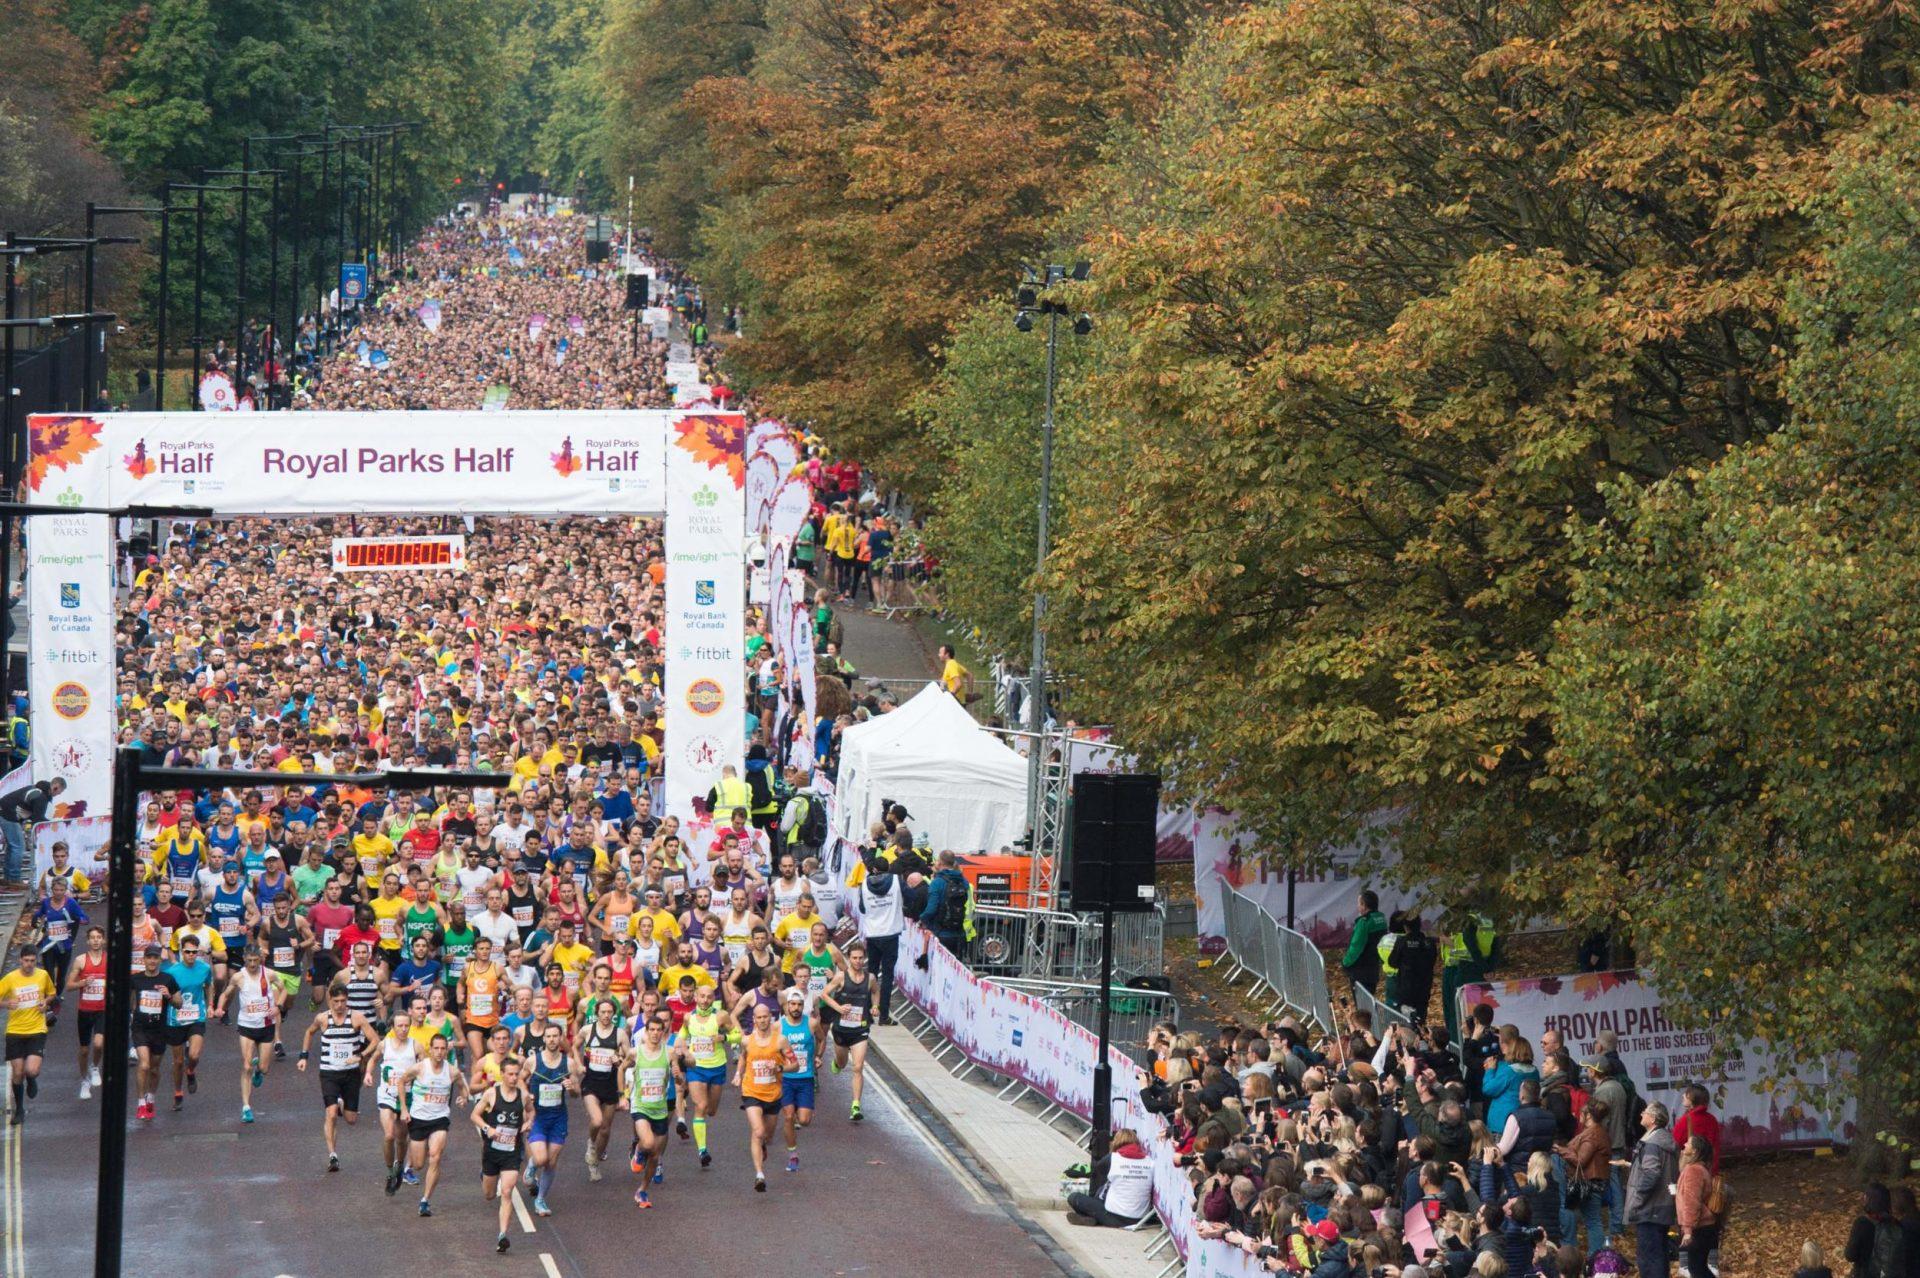 image of the royal parks half marathon